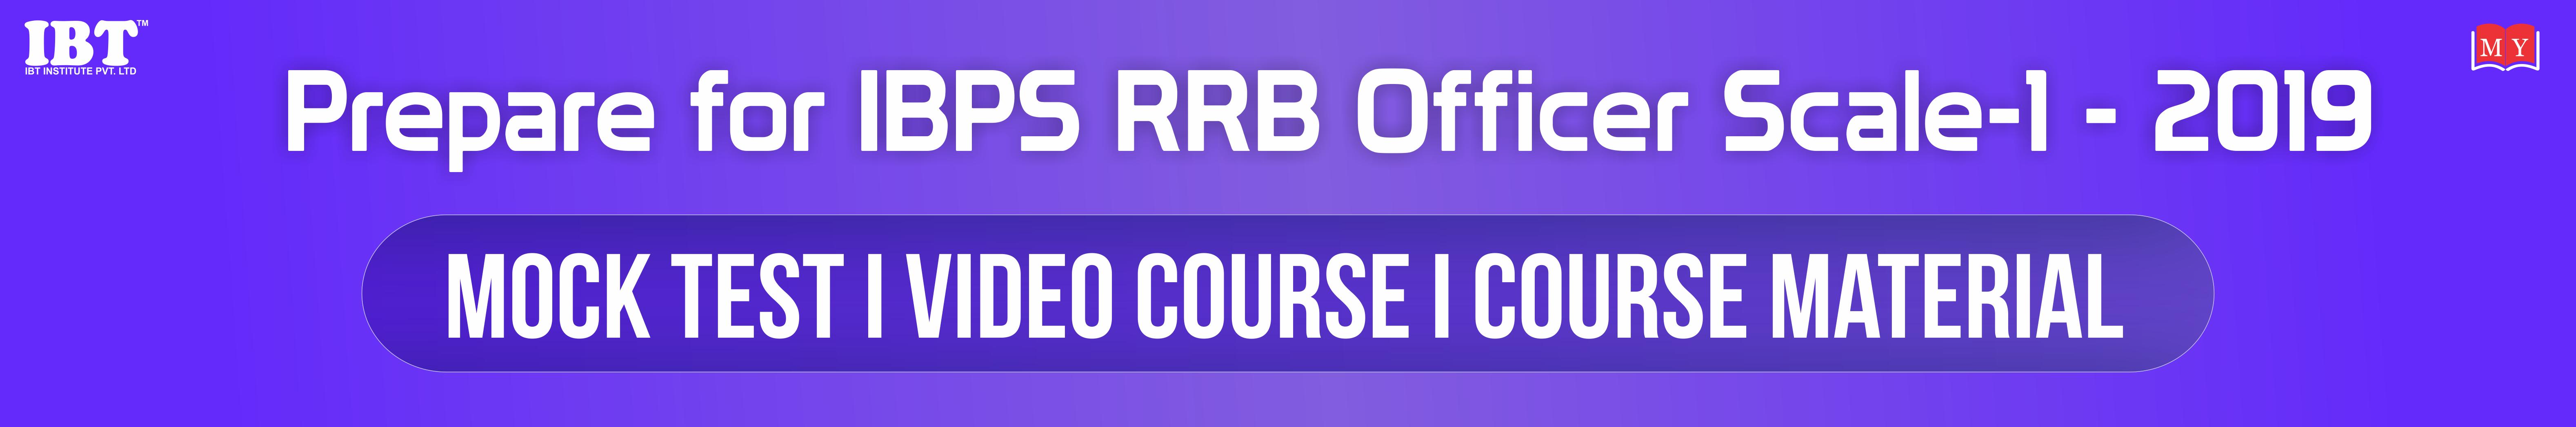 IBPS RRB 2019: Notification, Exam Dates, Vacancy, Pattern & Syllabus